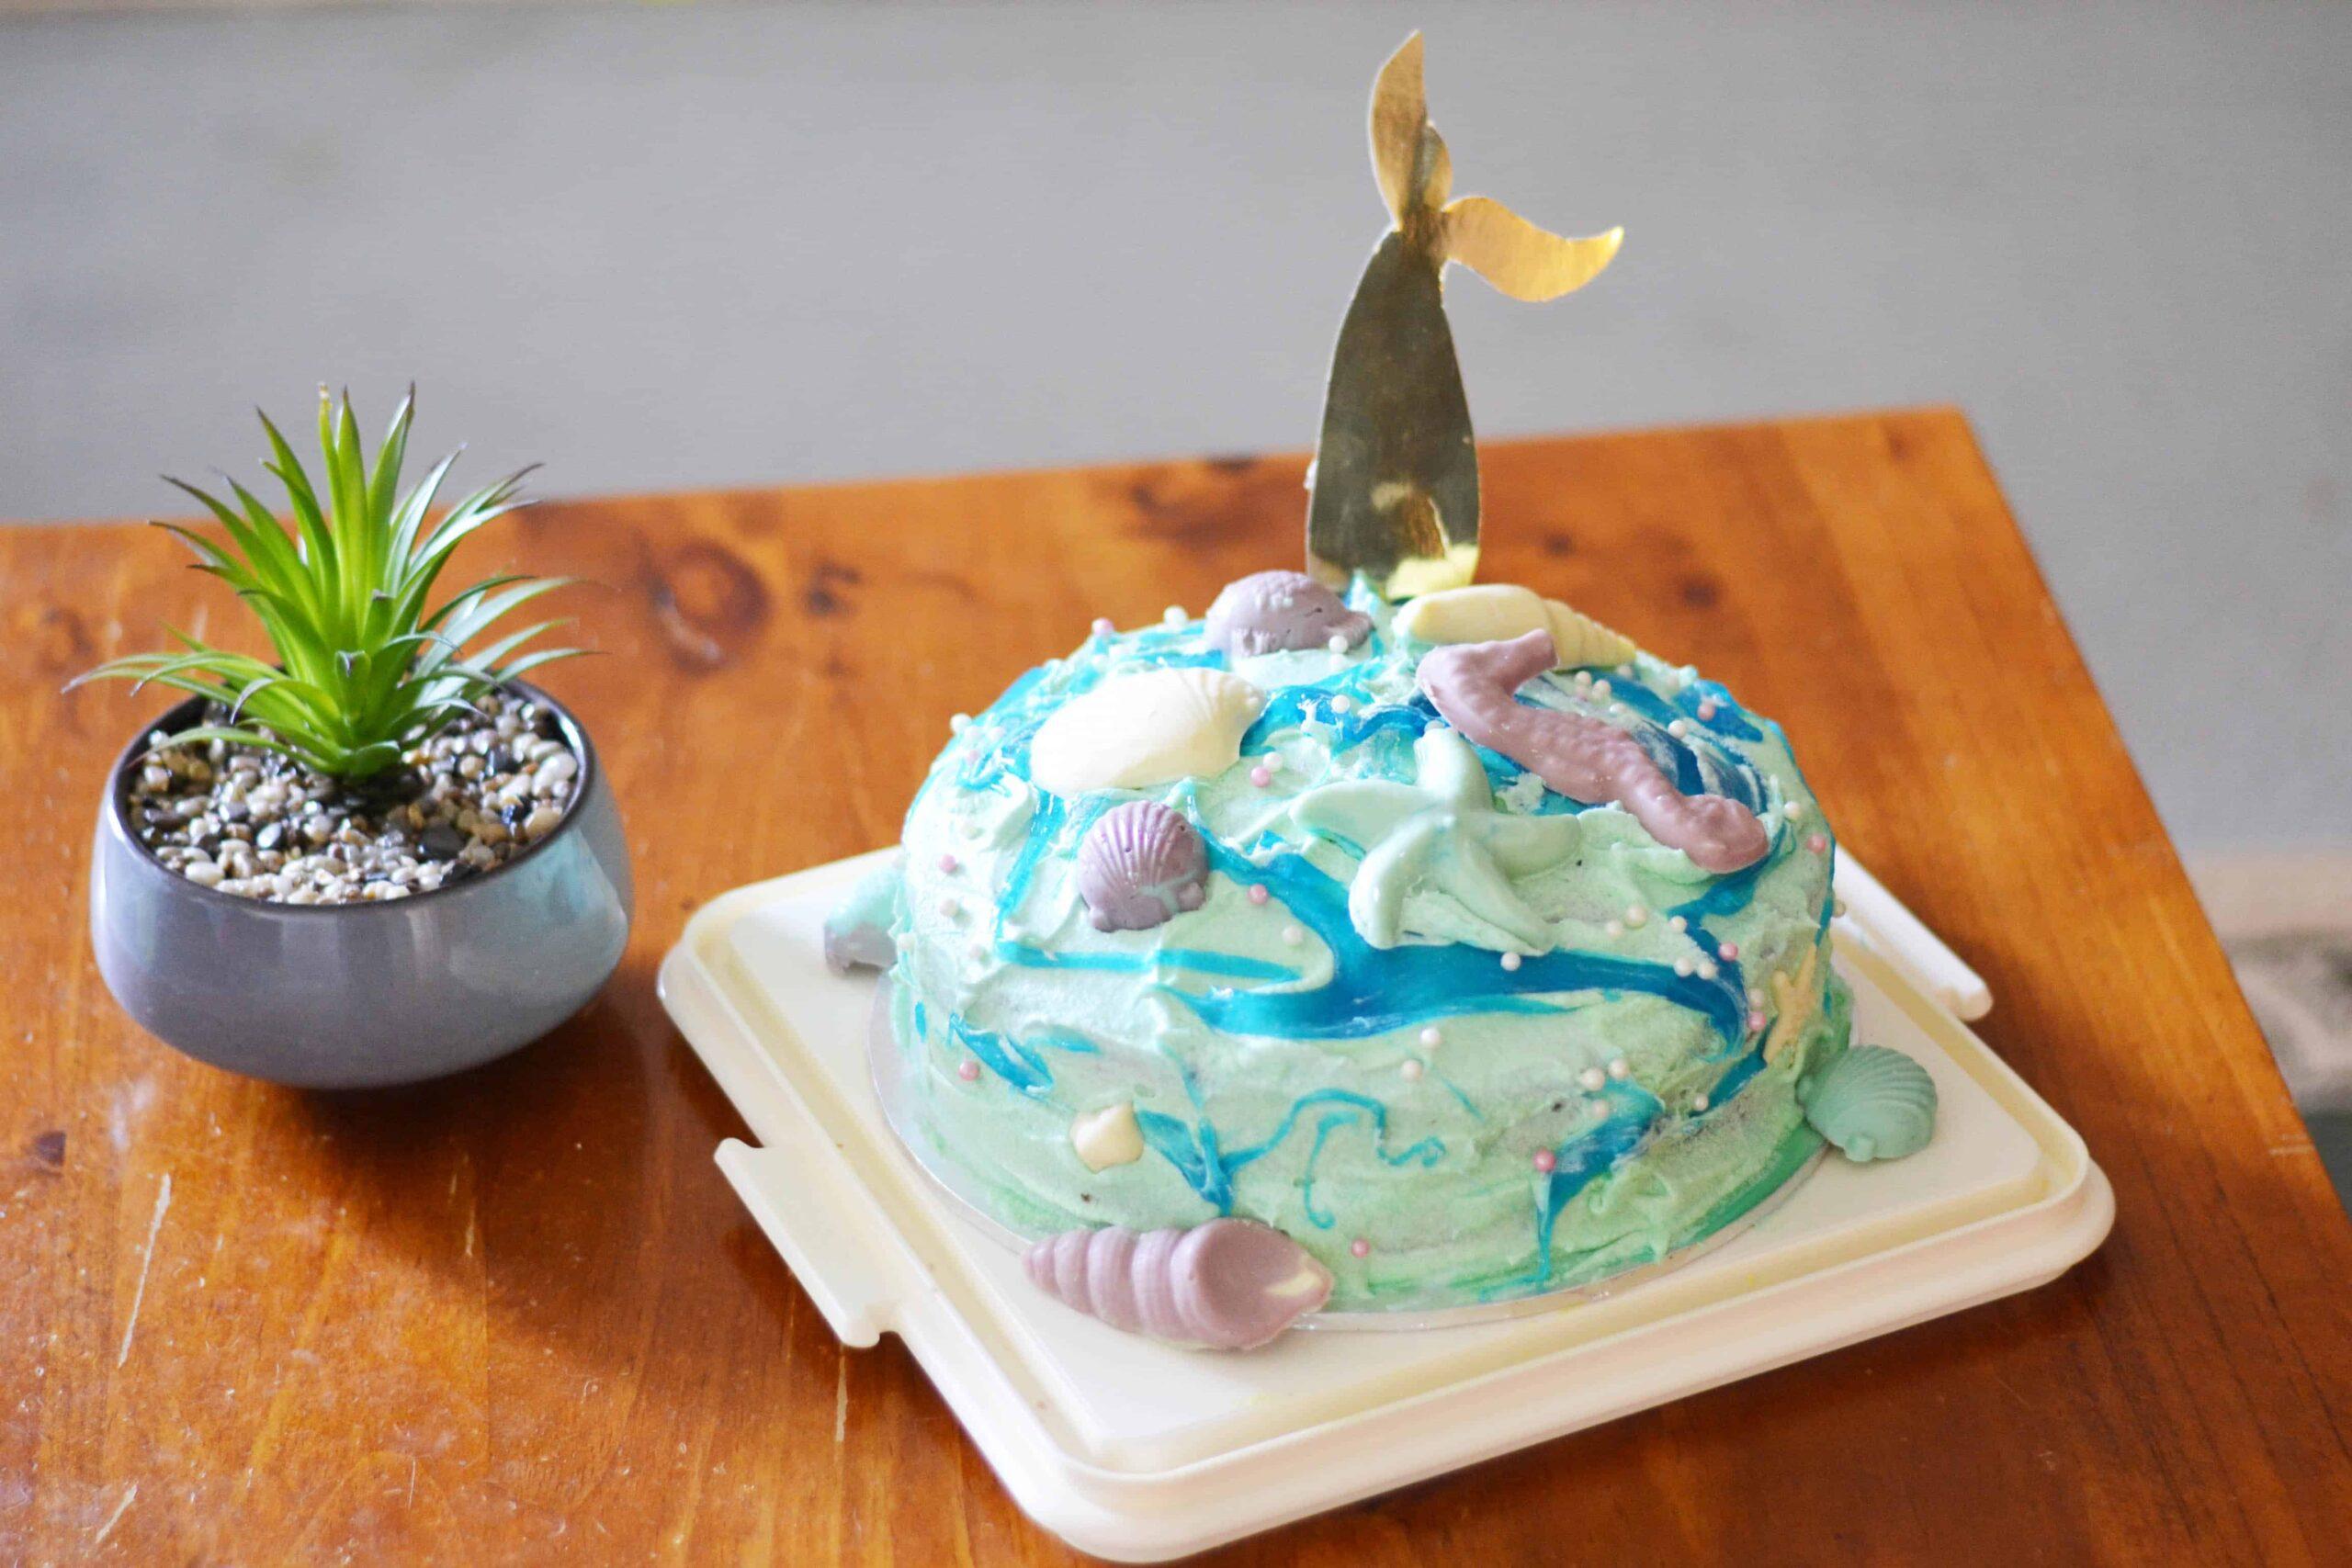 How to make a simple DIY mermaid cake